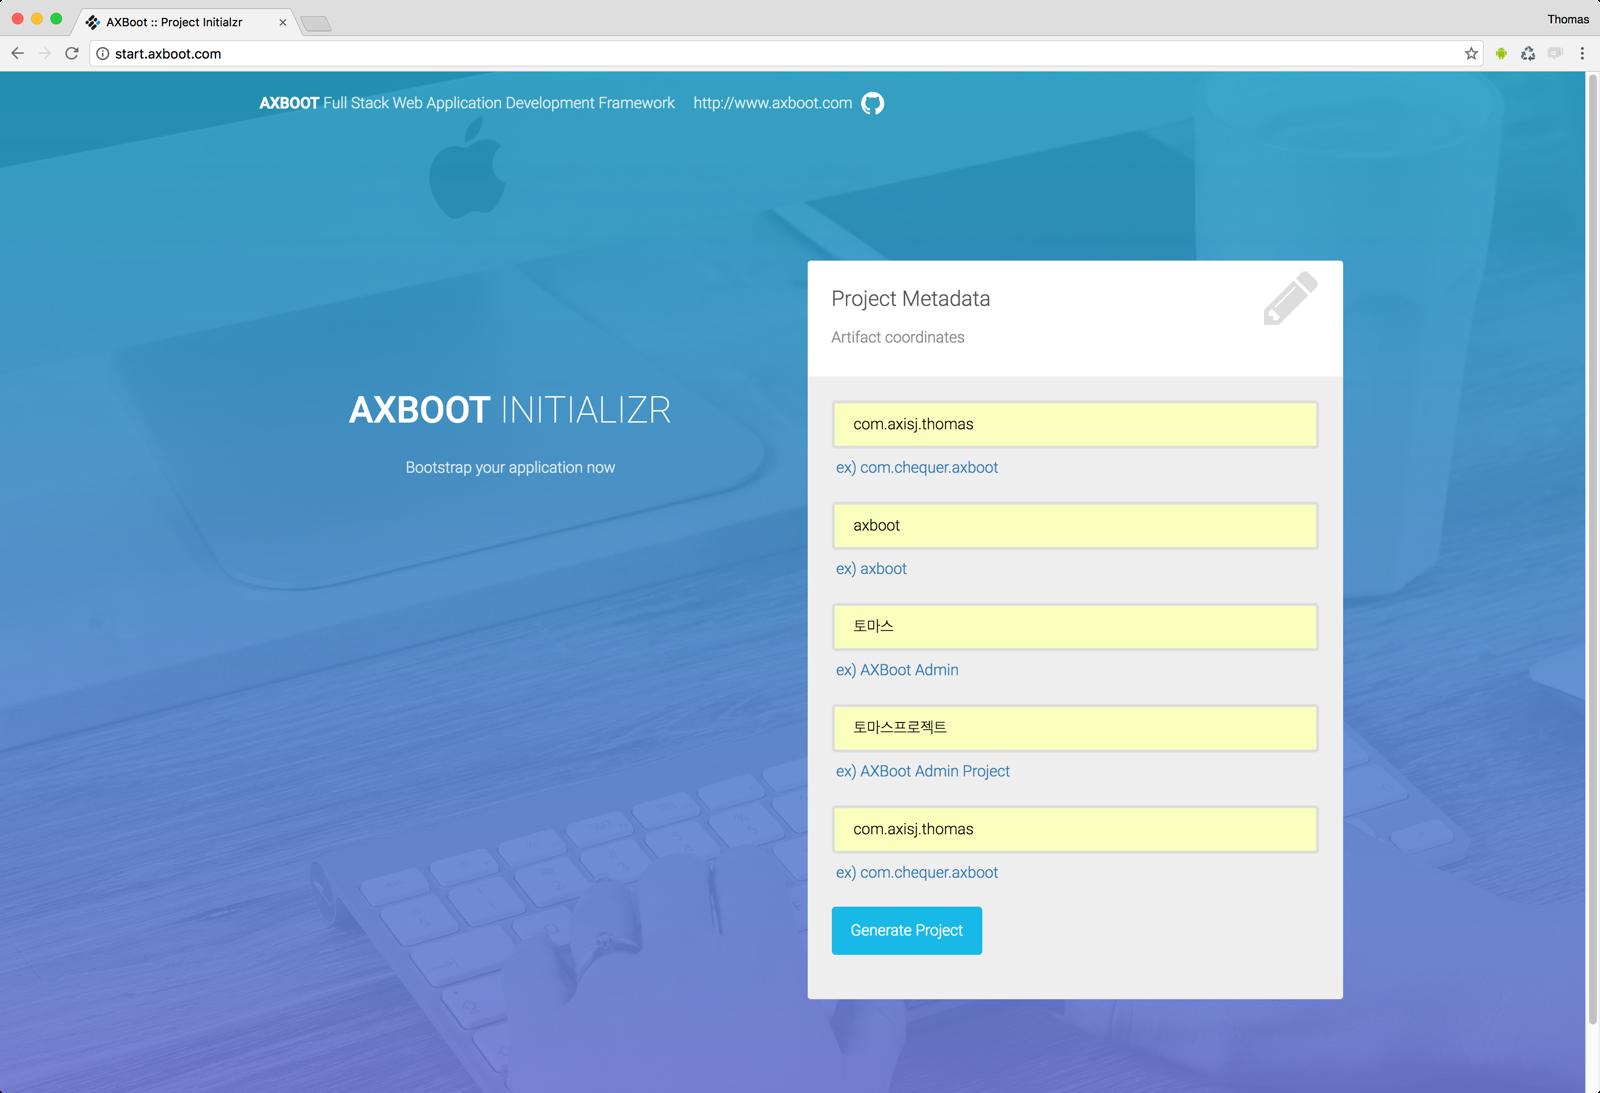 axboot, 소스코드 생성하기 1